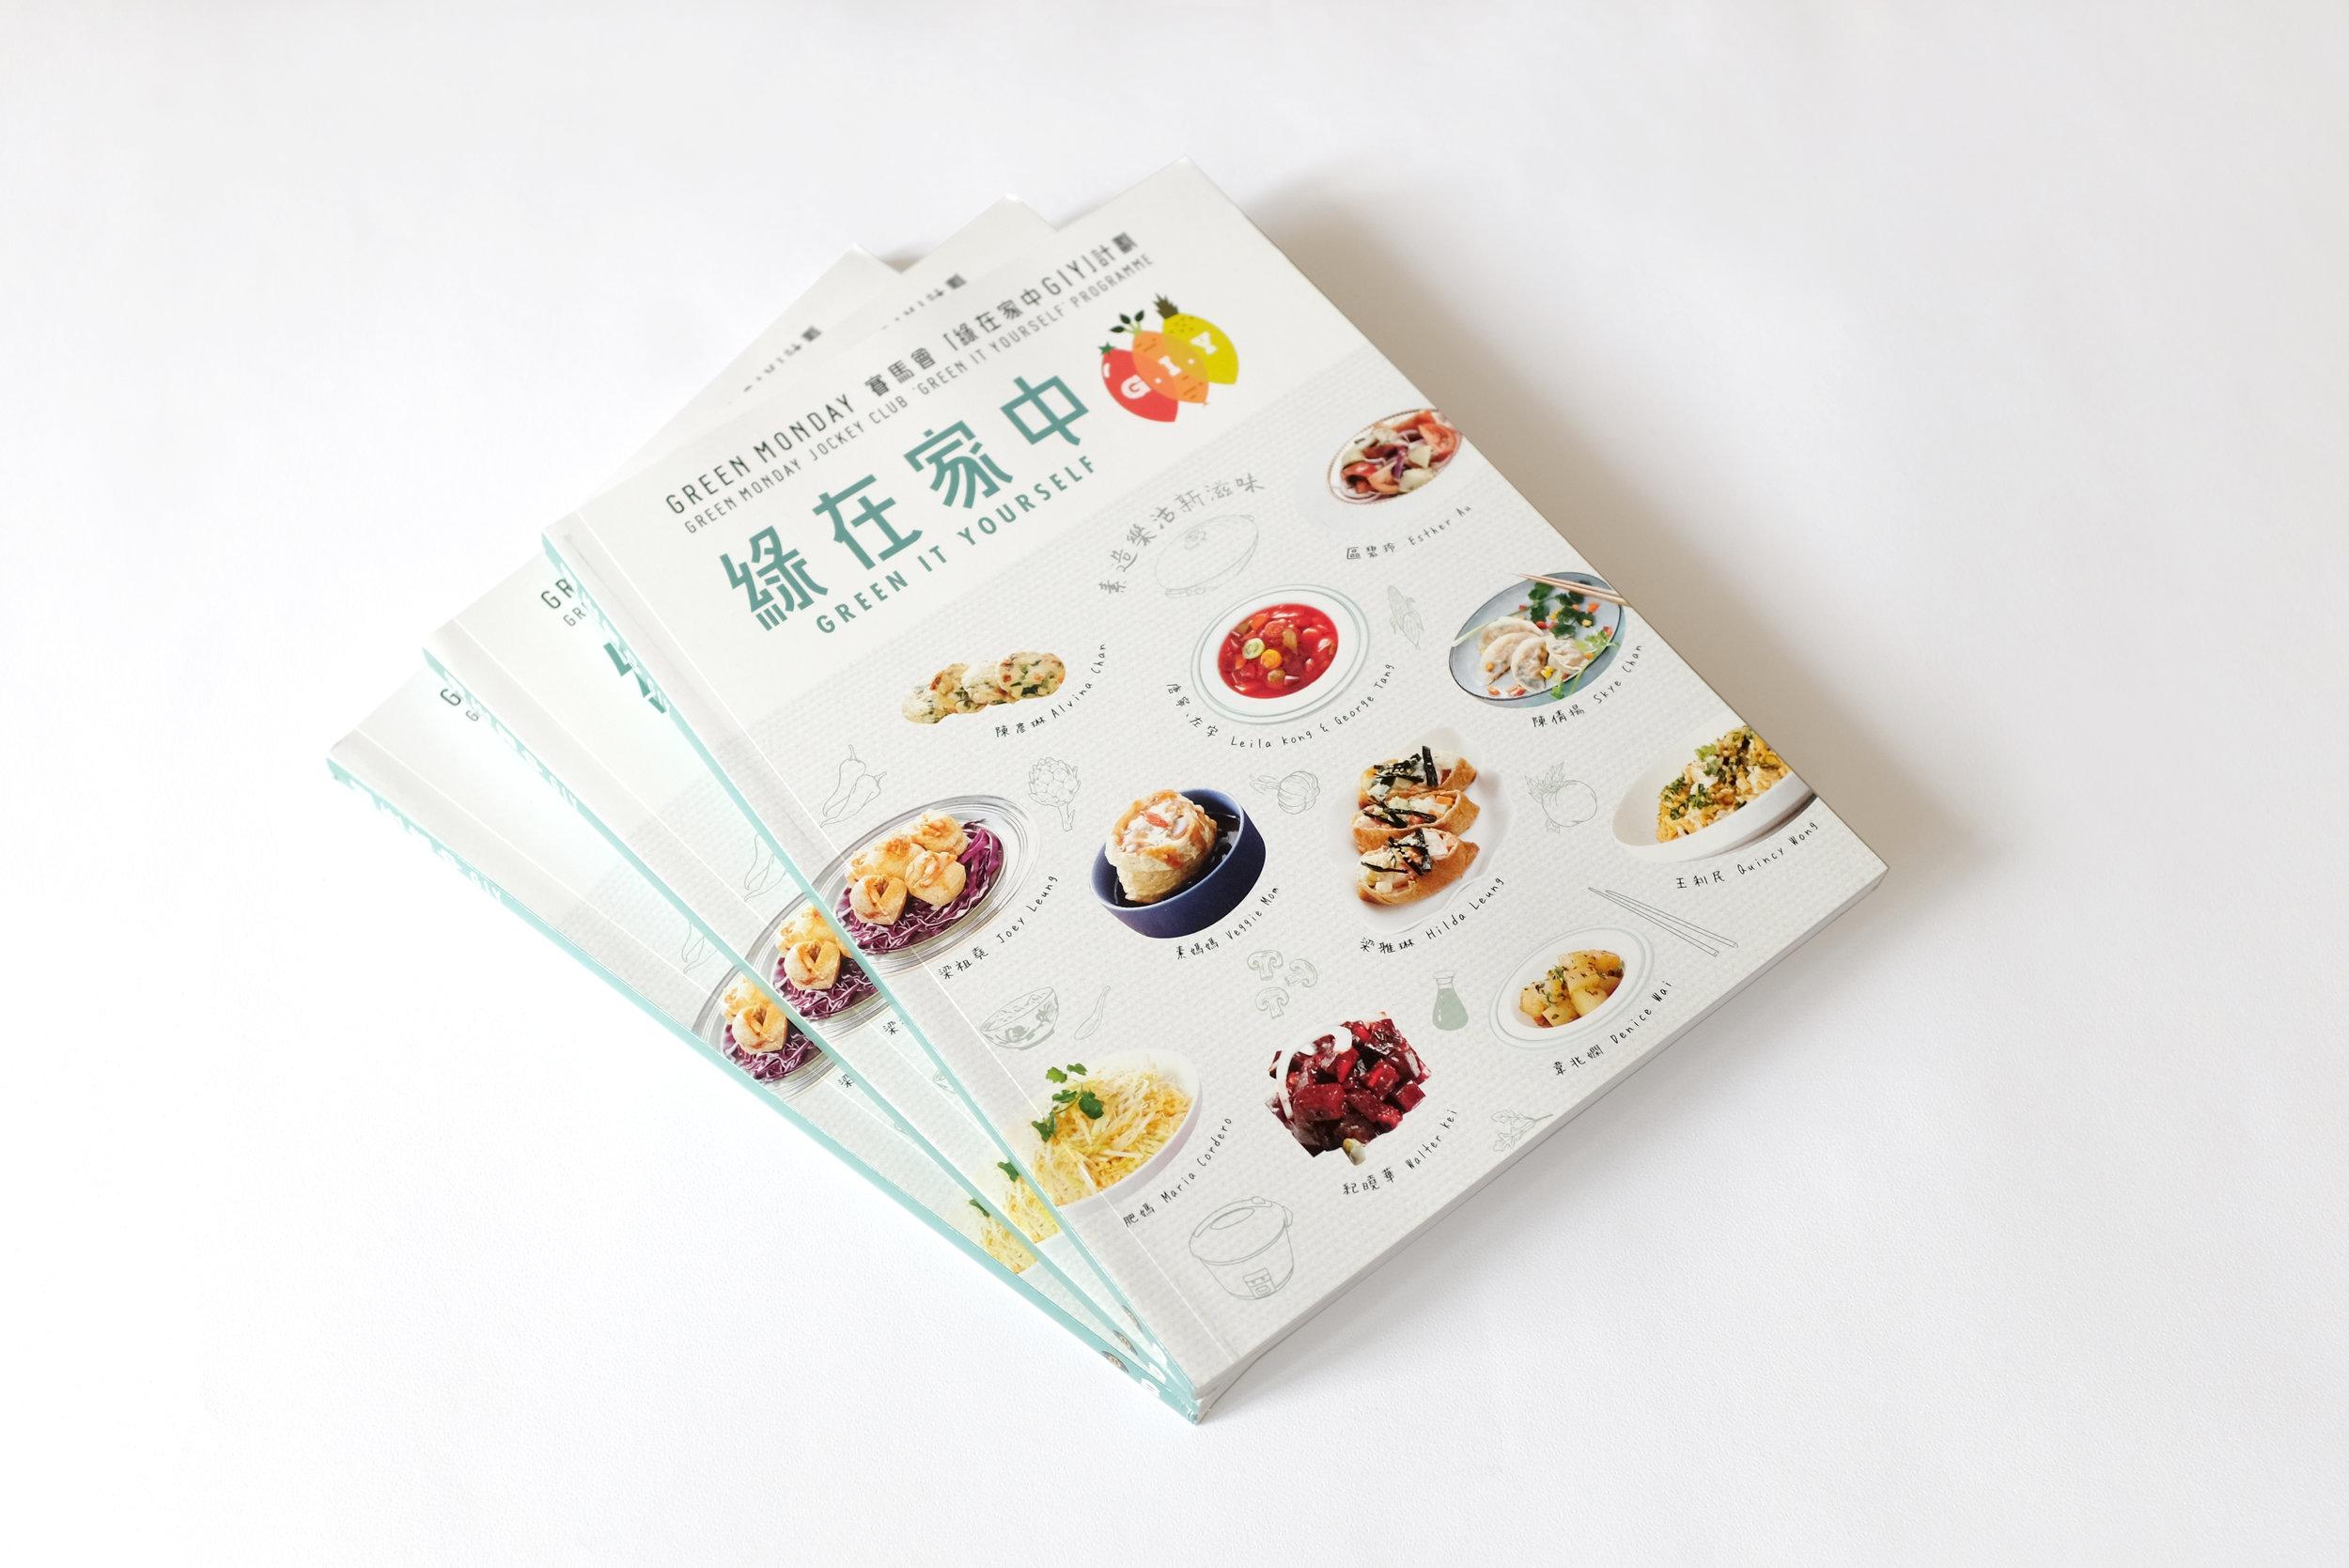 BOOK COVER DESIGN FOR GIY RECIPE BOOK - 2016